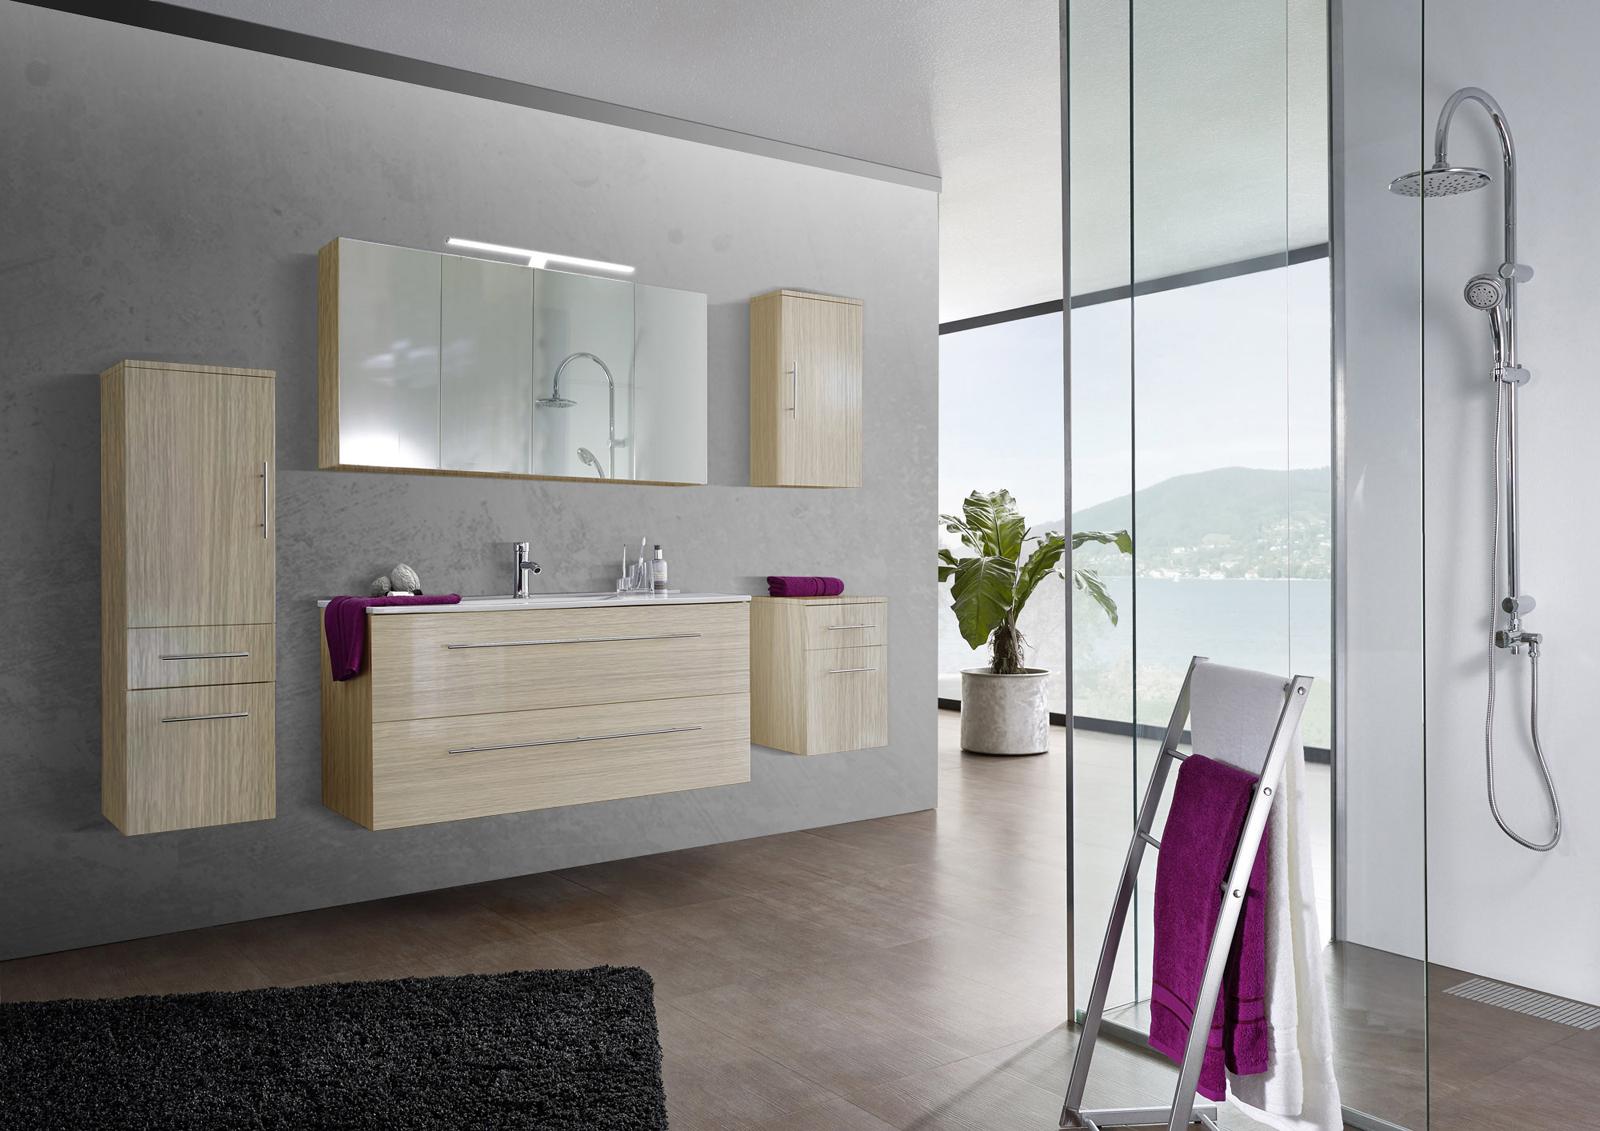 sam 5tlg badezimmer set sonomaeiche 120 cm verena auf lager. Black Bedroom Furniture Sets. Home Design Ideas